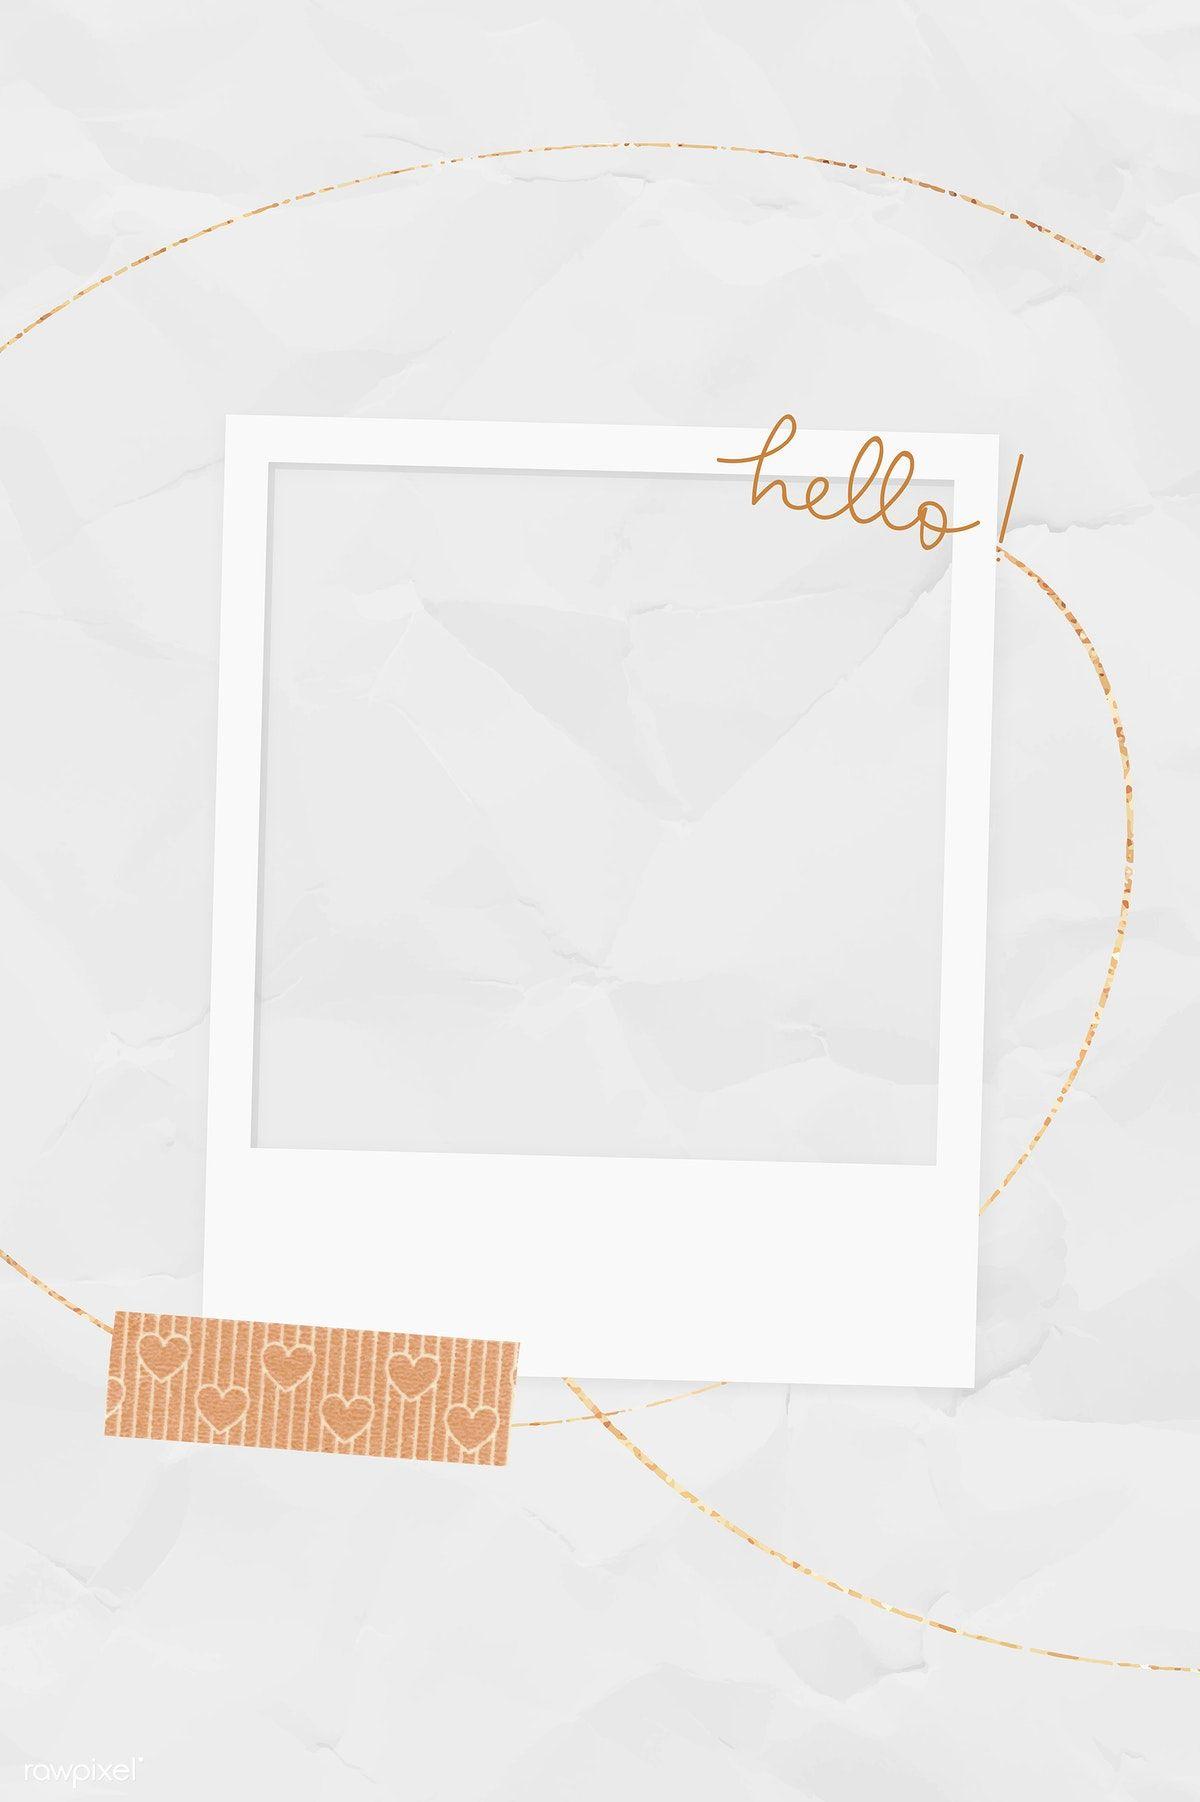 Download Premium Illustration Of Blank Collage Photo Frame Template Vector Molduras Para Fotos Montagens Molduras Para Fotos Digitais Bordas Para Fotos